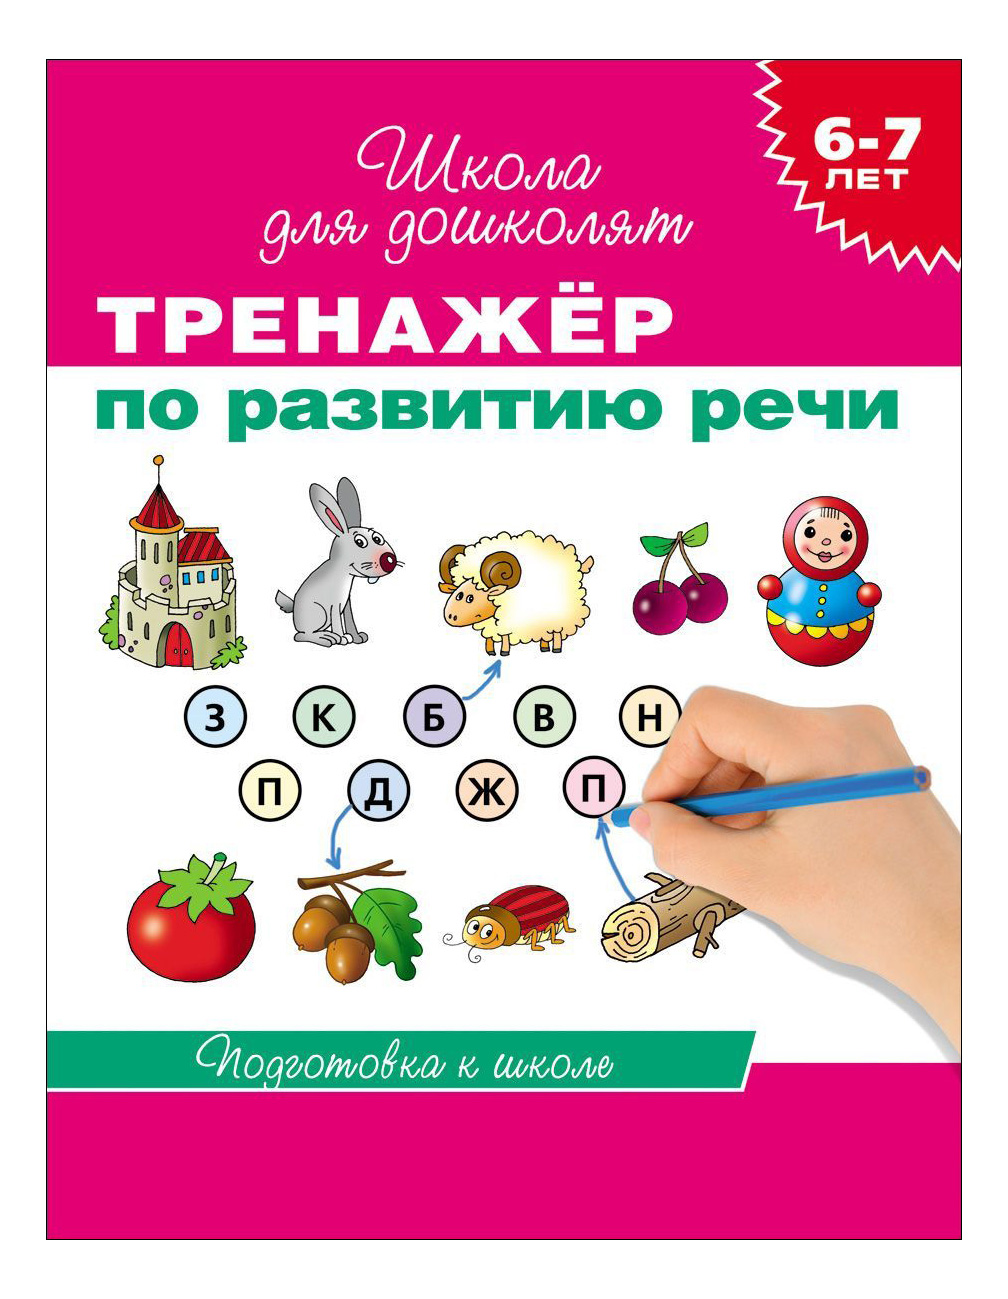 Тренажер по развитию Речи 6-7 лет. Светлана Гаврина фото